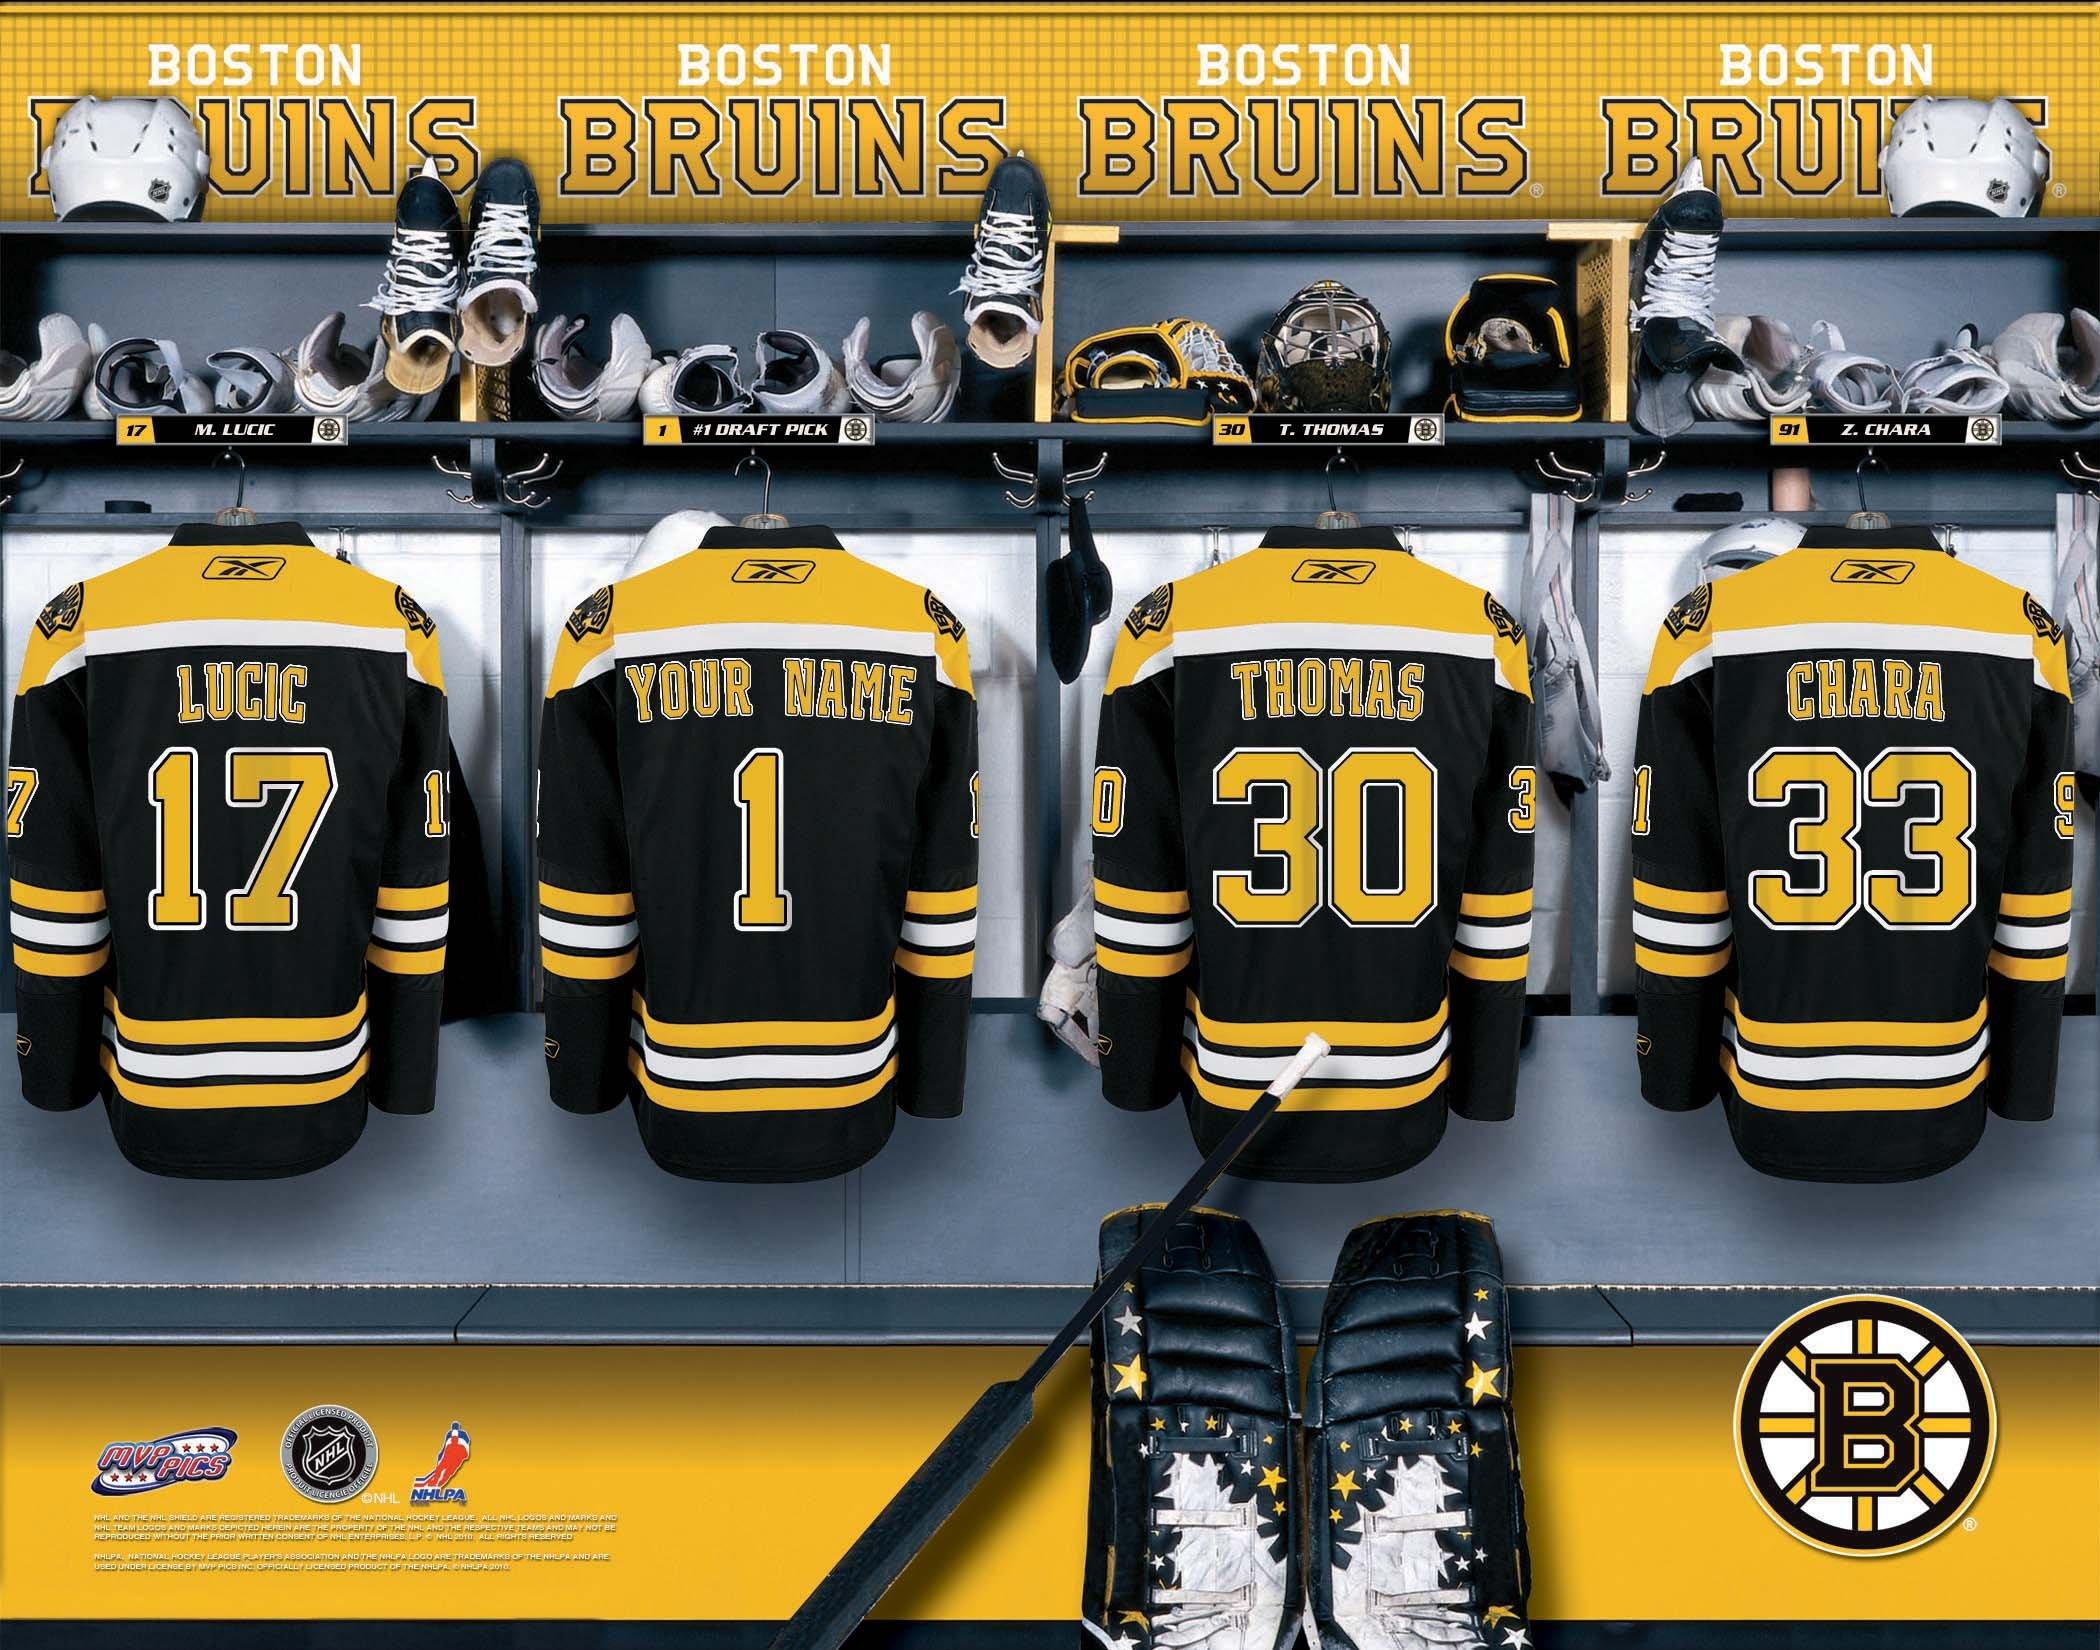 BOSTON BRUINS nhl hockey 20 wallpaper 2100x1650 336461